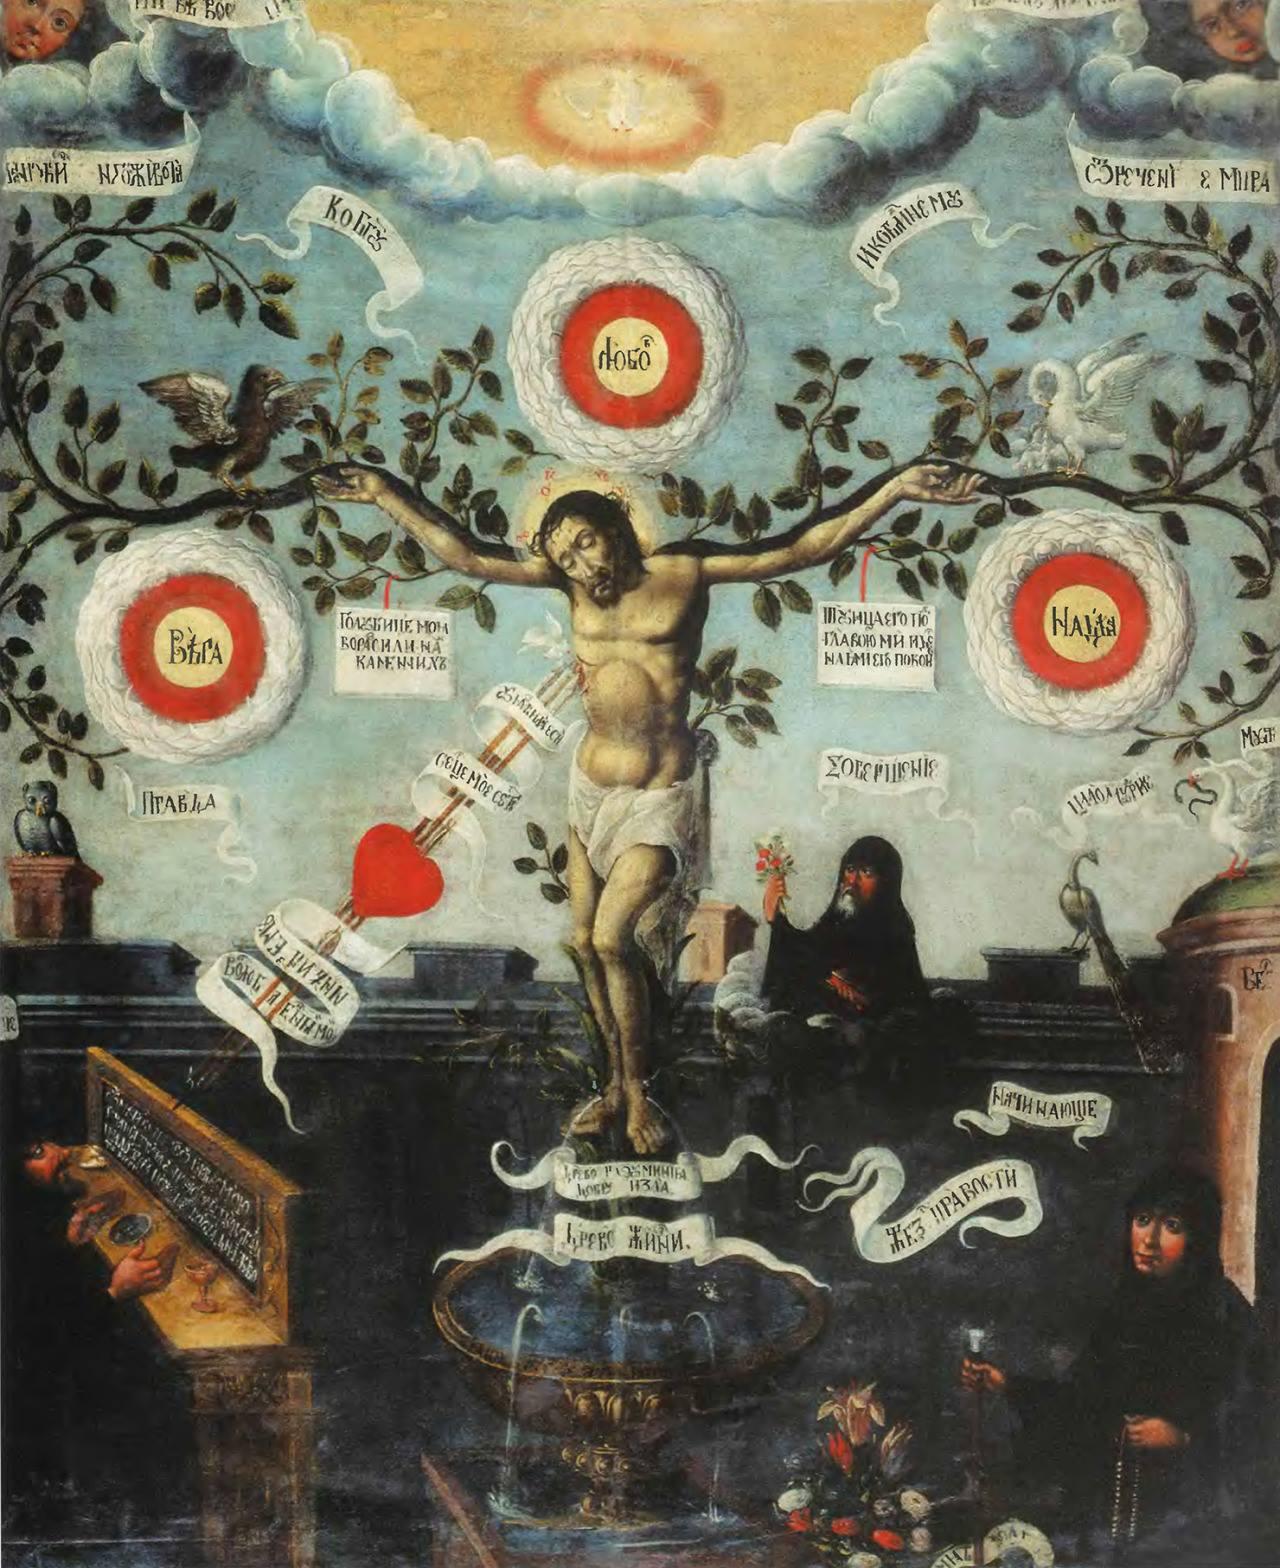 Križanje, razcveteli križ, ikona, XIX. stoletje